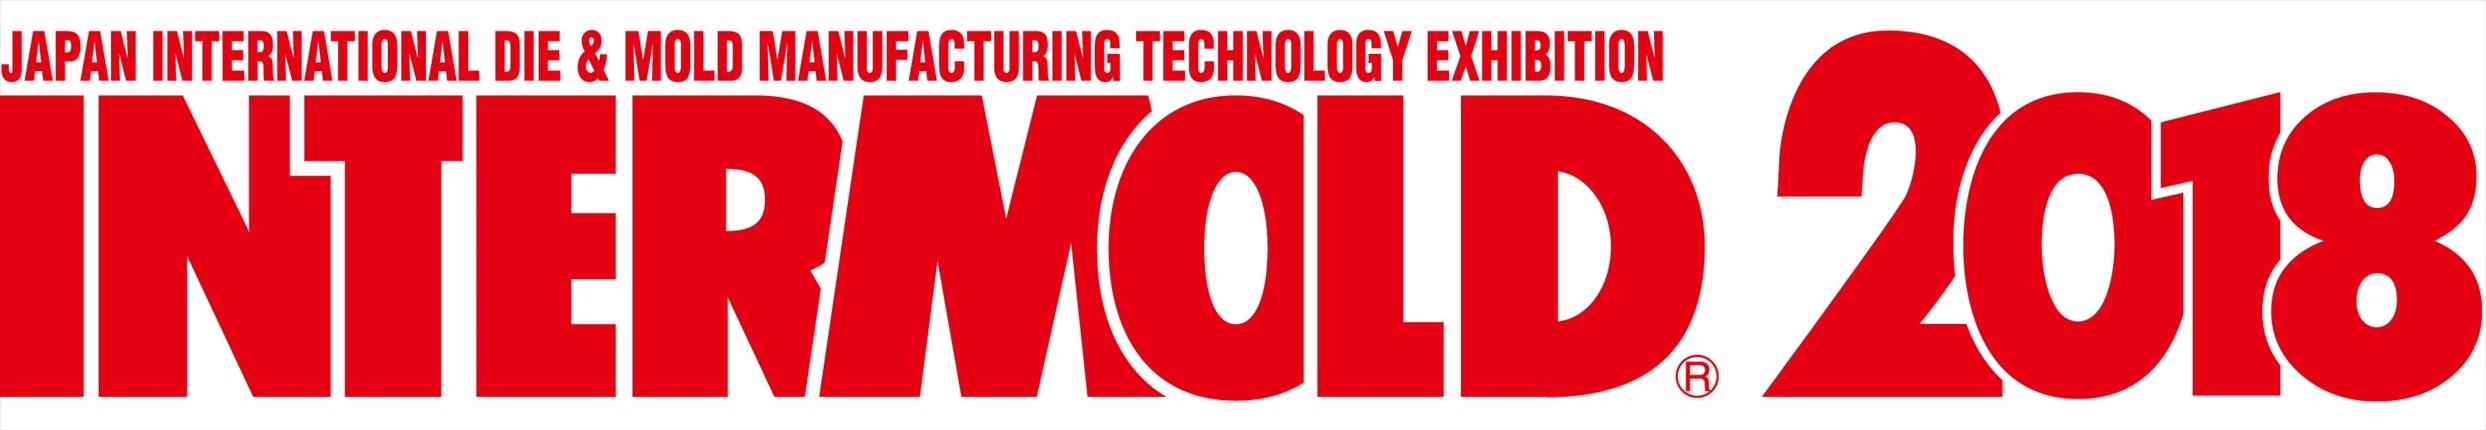 INTERMOLD2018〜金型の未来〜<br>世界の加工技術一堂